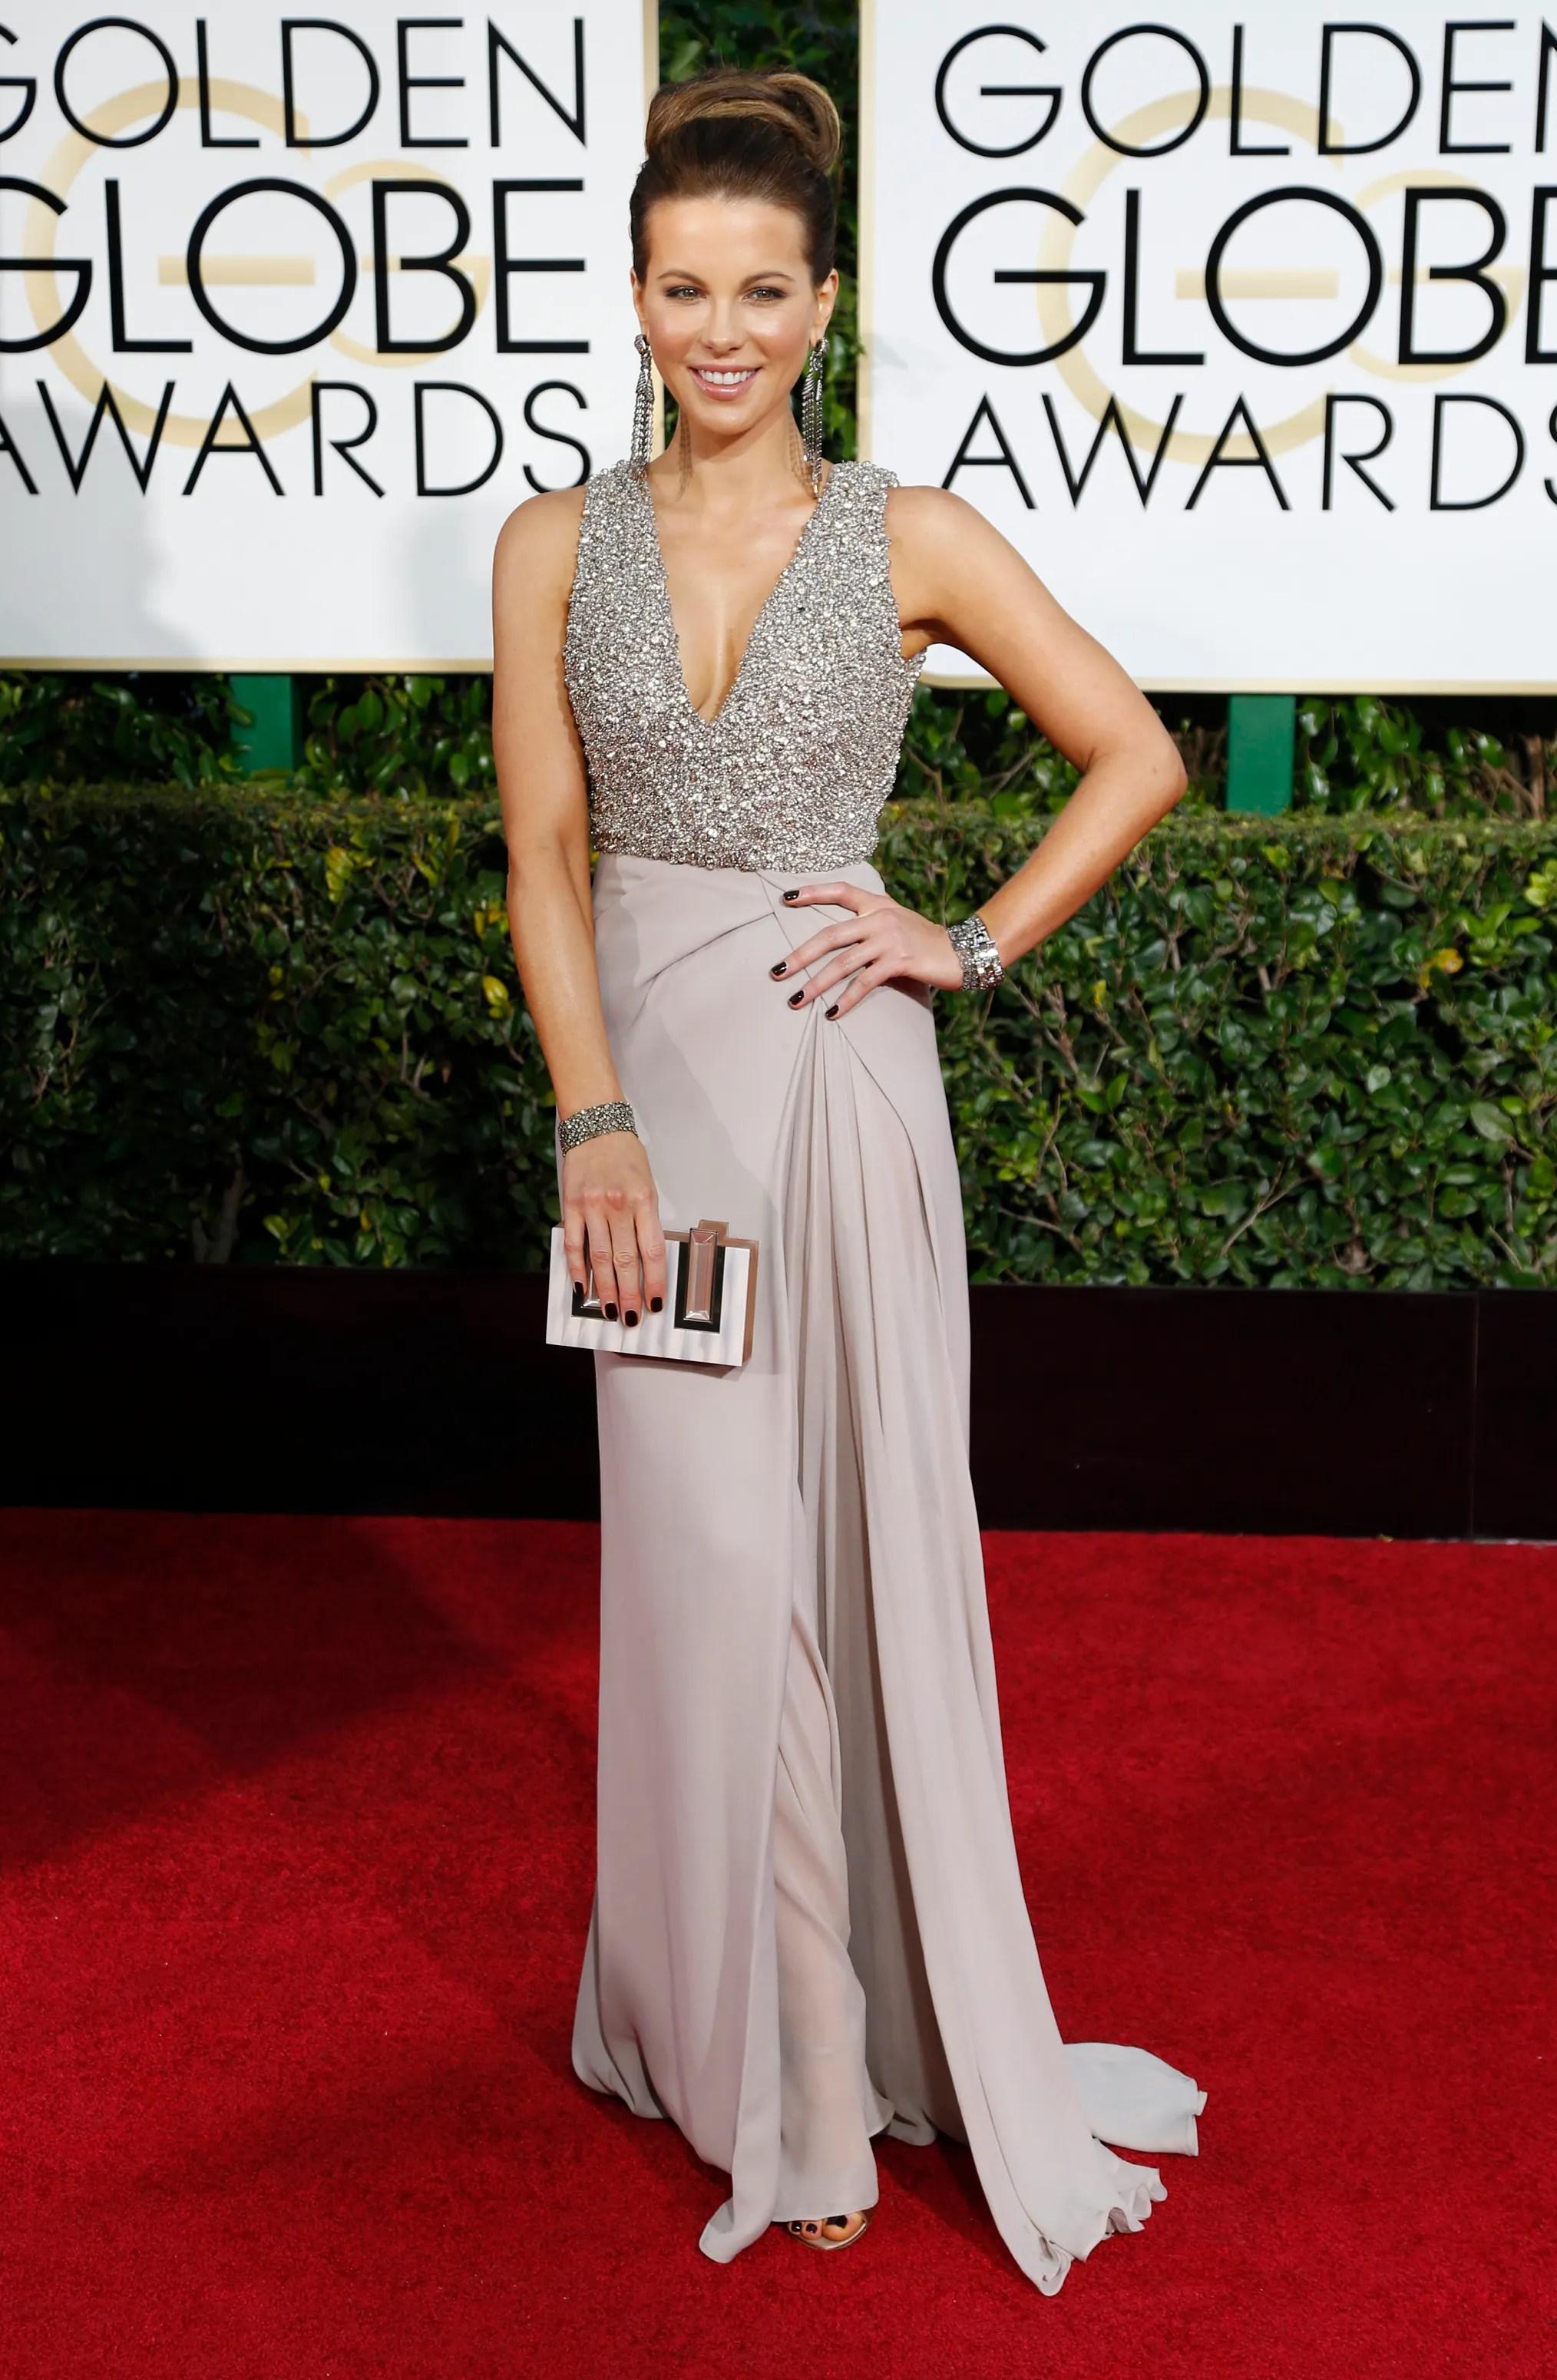 Kate Beckinsale: Hot